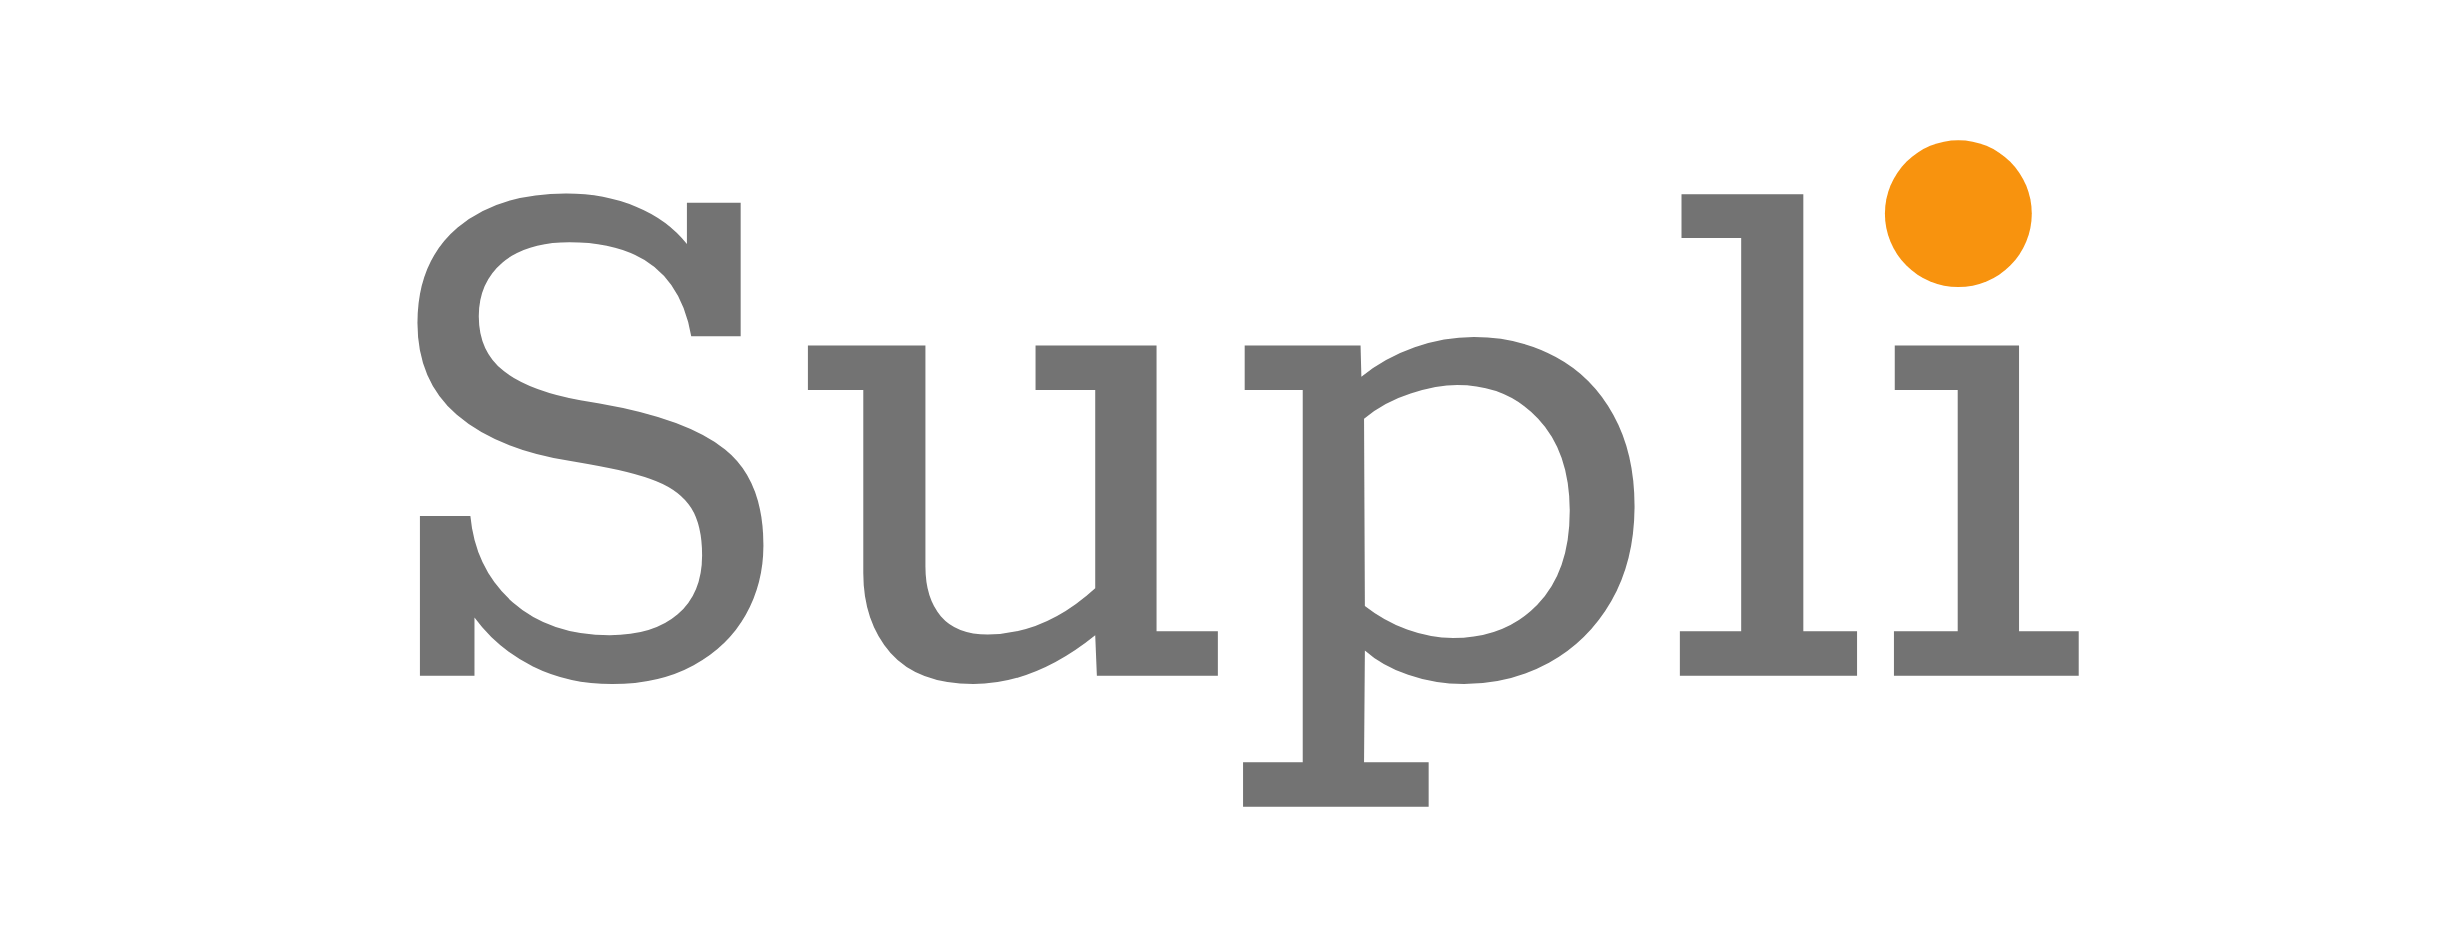 Suomen Uusperheiden Liitto ry:n logo